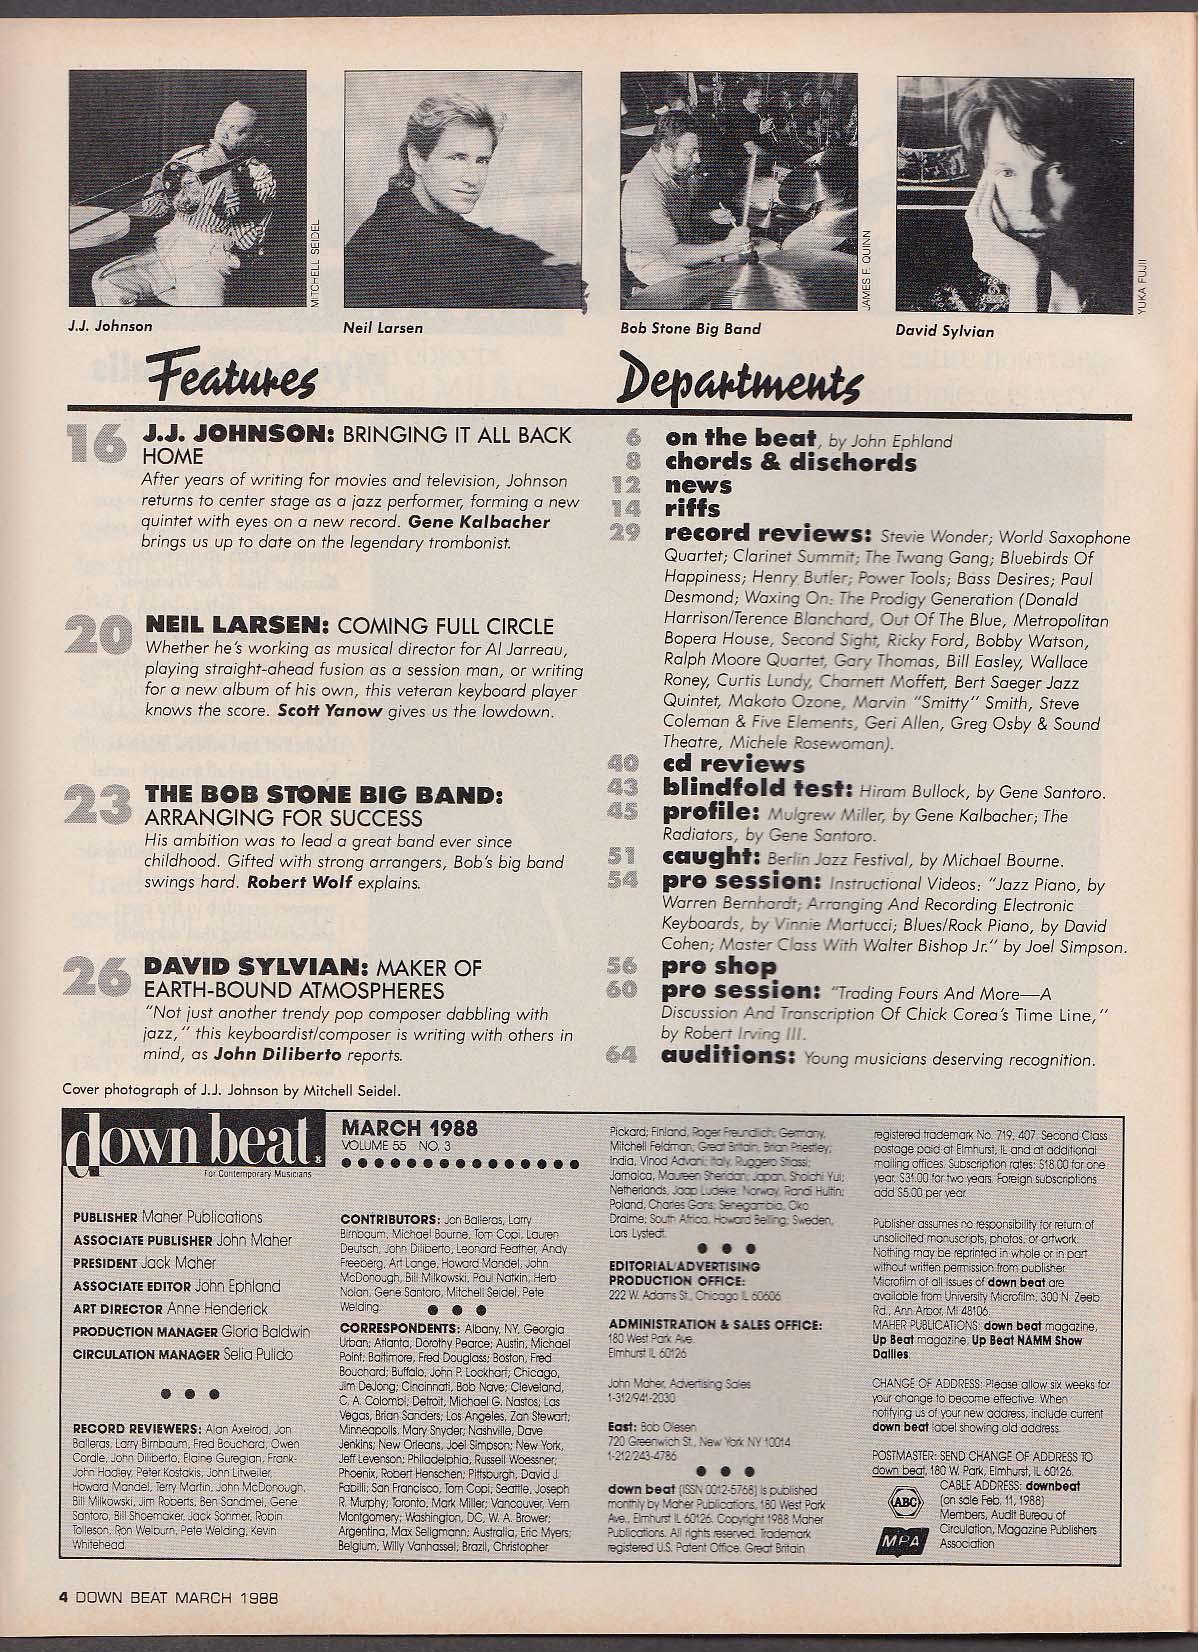 DOWN BEAT J J Johnson Neil Larsen David Sylvian Bob Stone 3 1988